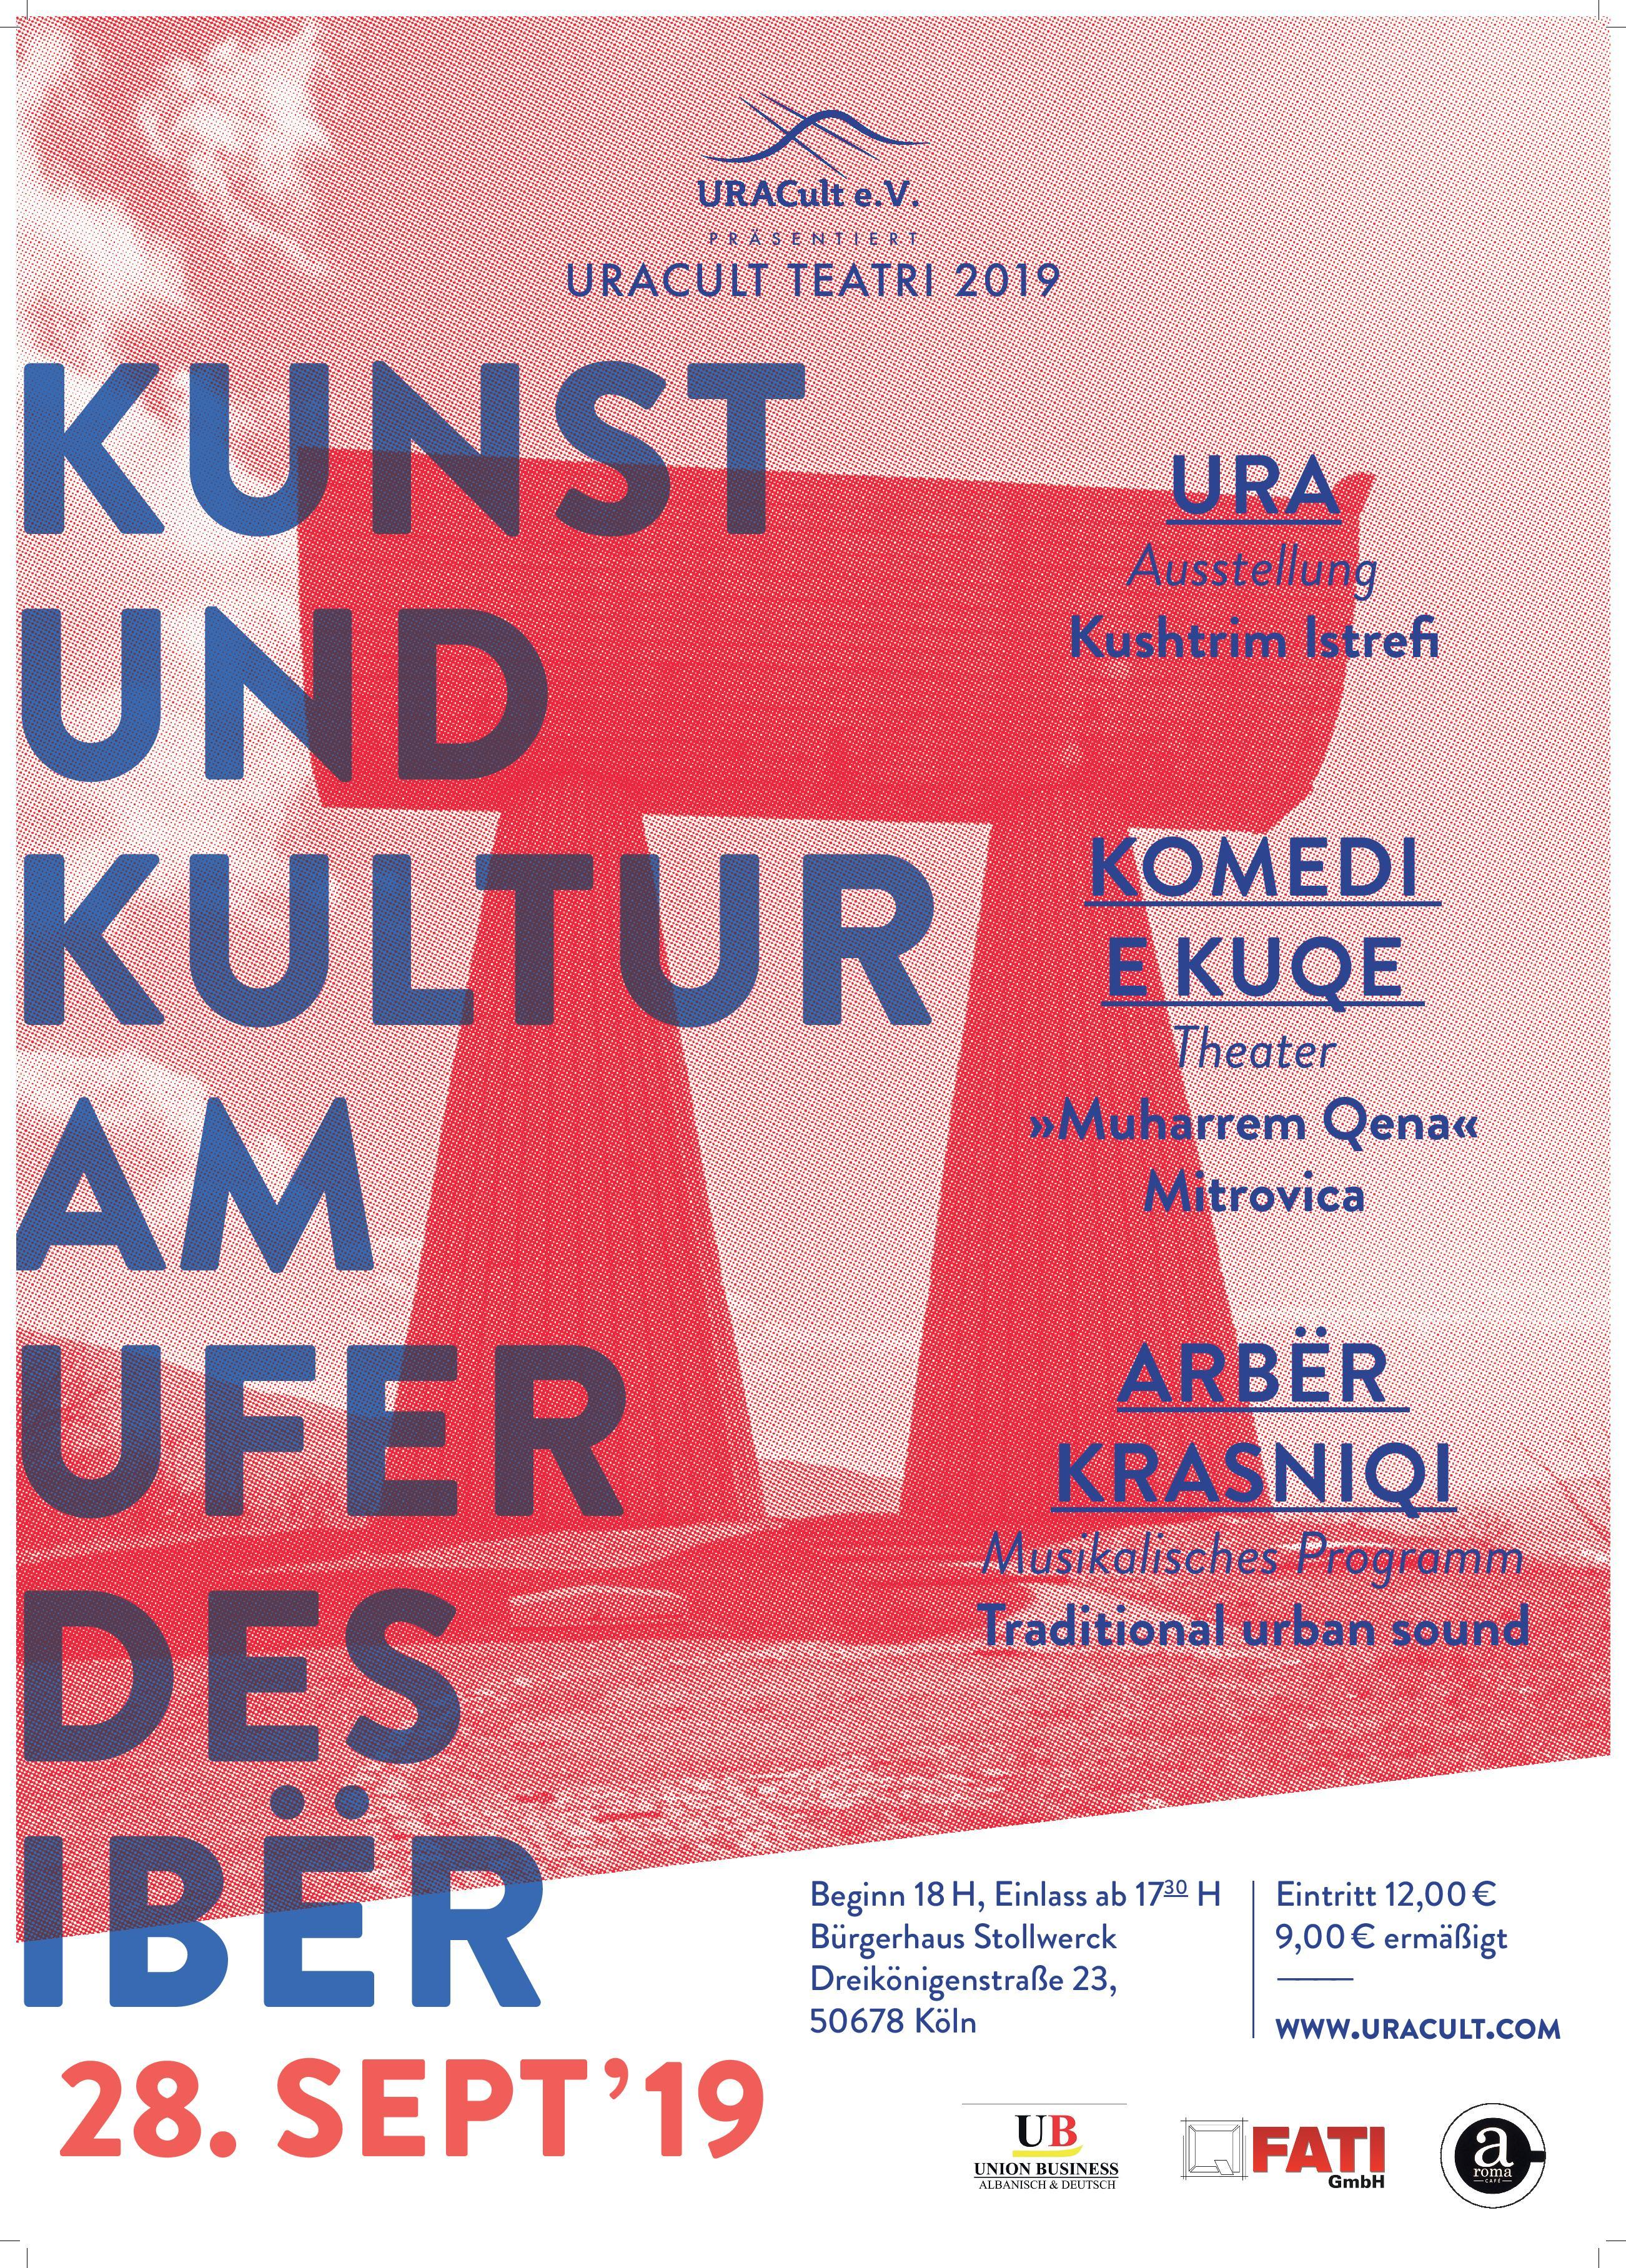 URACult Teatri 2019 Poster